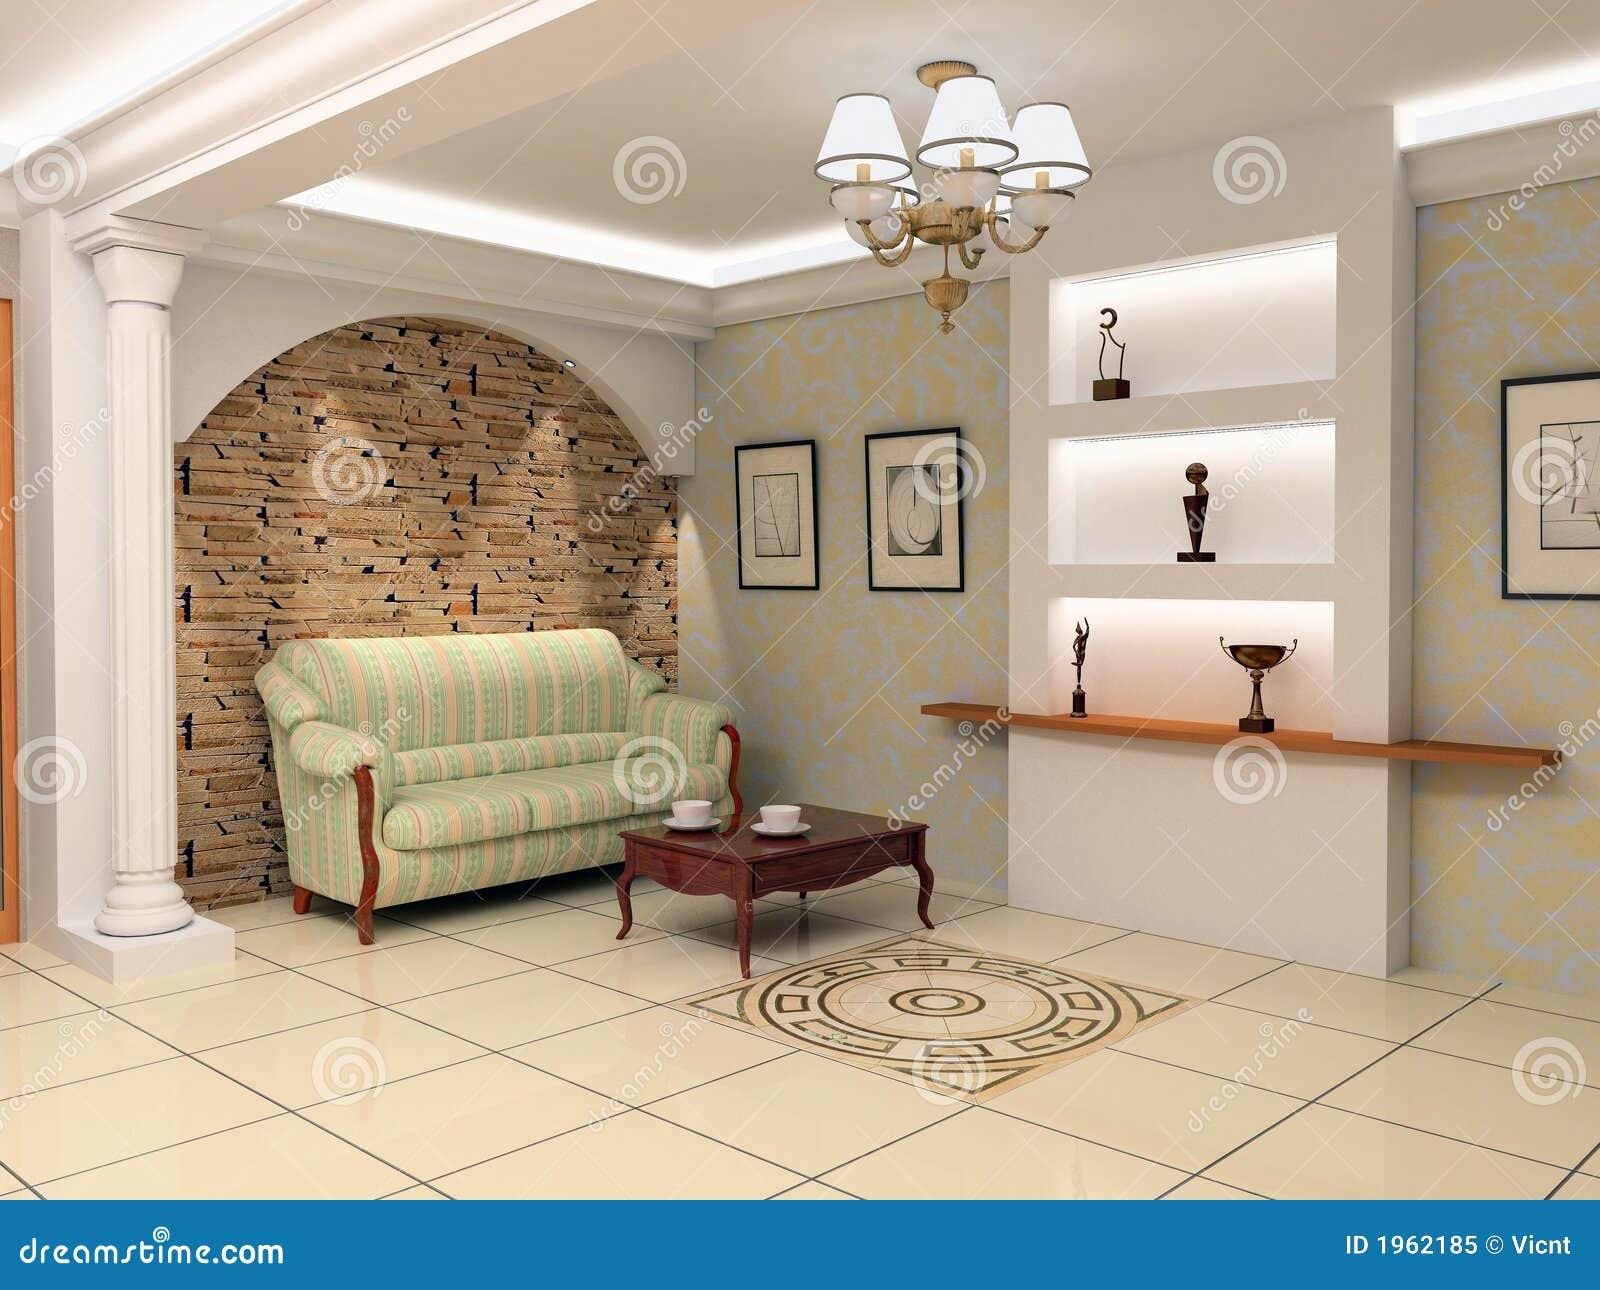 Apartment Foyer Interior Design : Modern foyer interior royalty free stock photo image